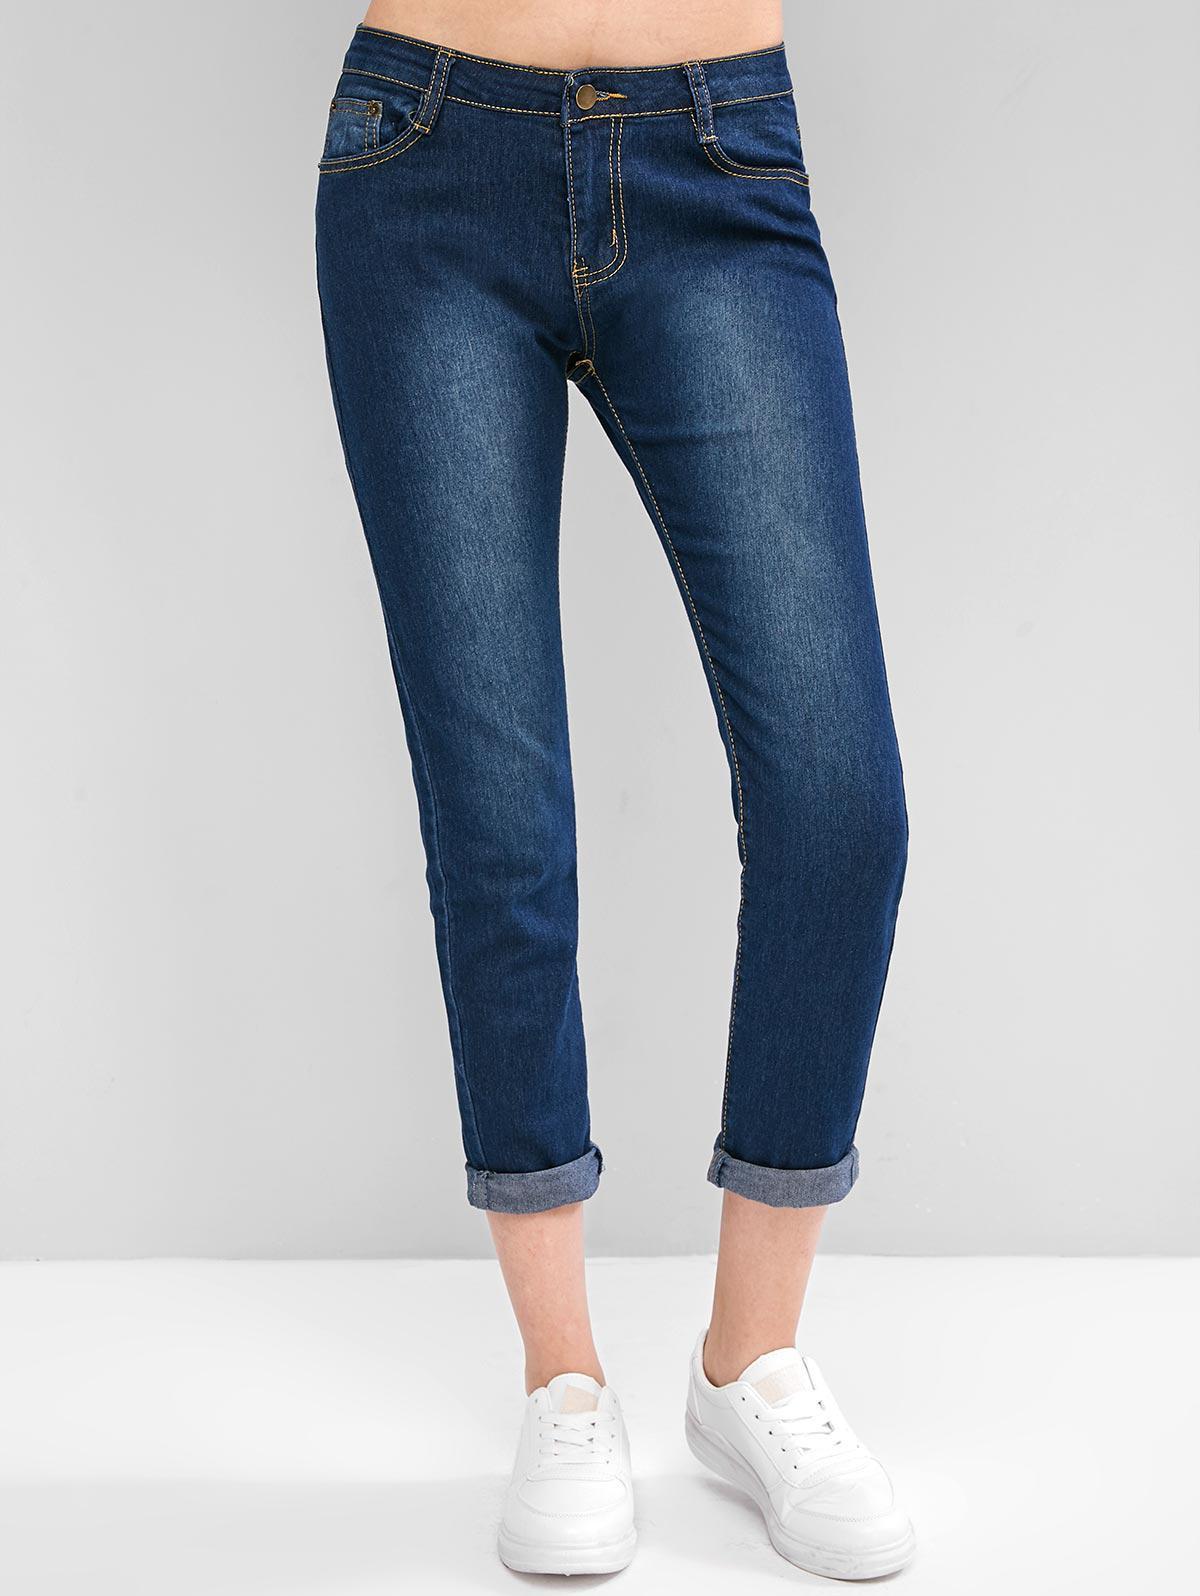 Bleach Wash Mid Rise Skinny Jeans